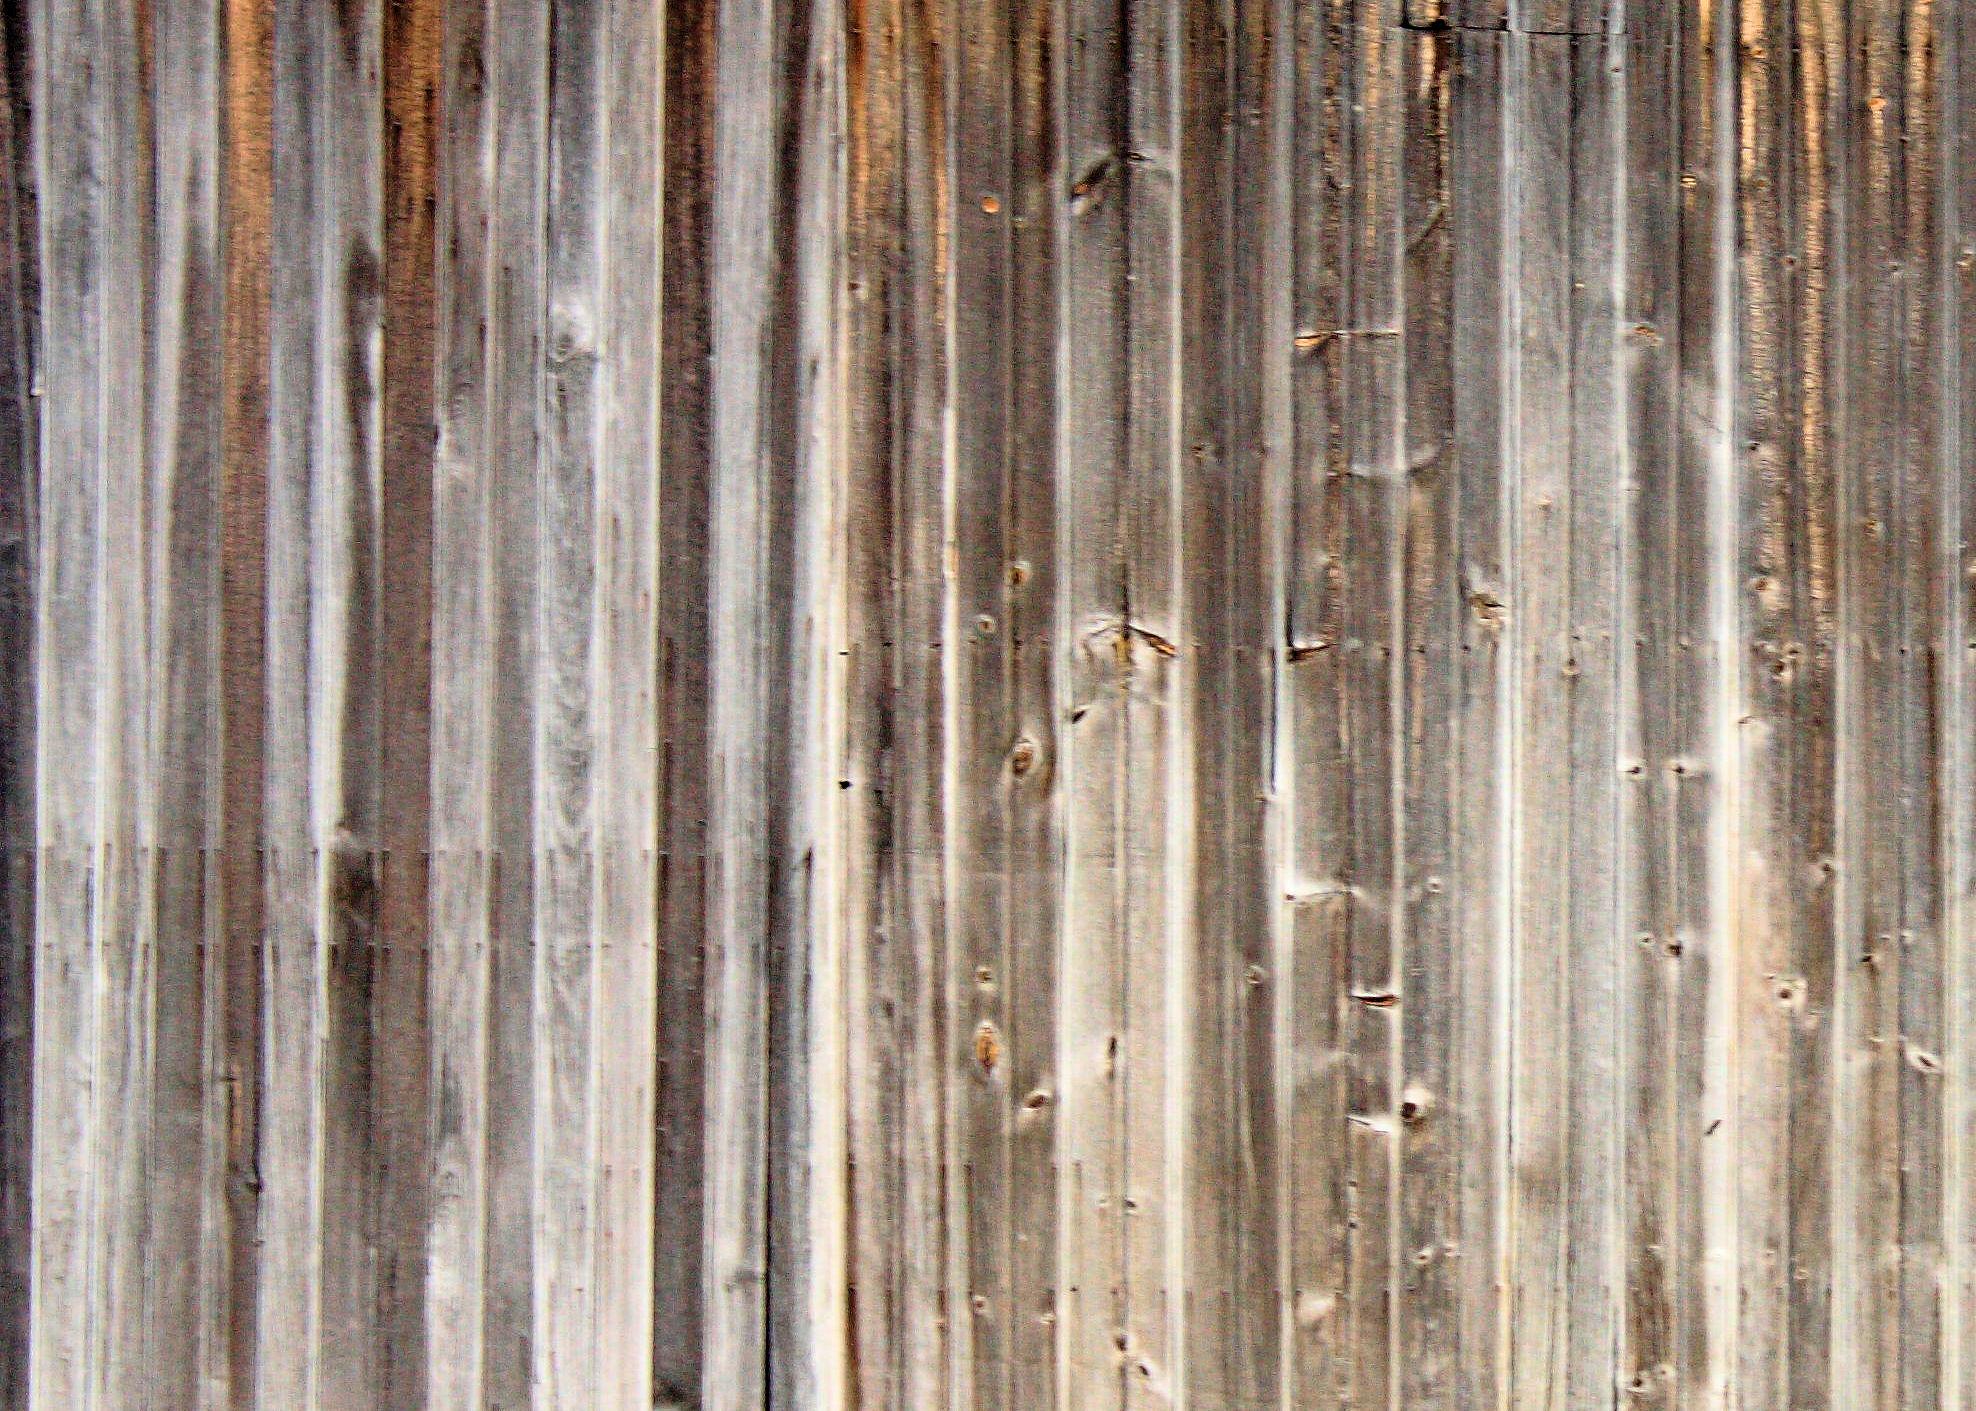 Old Barn Wood Siding 1976x1411